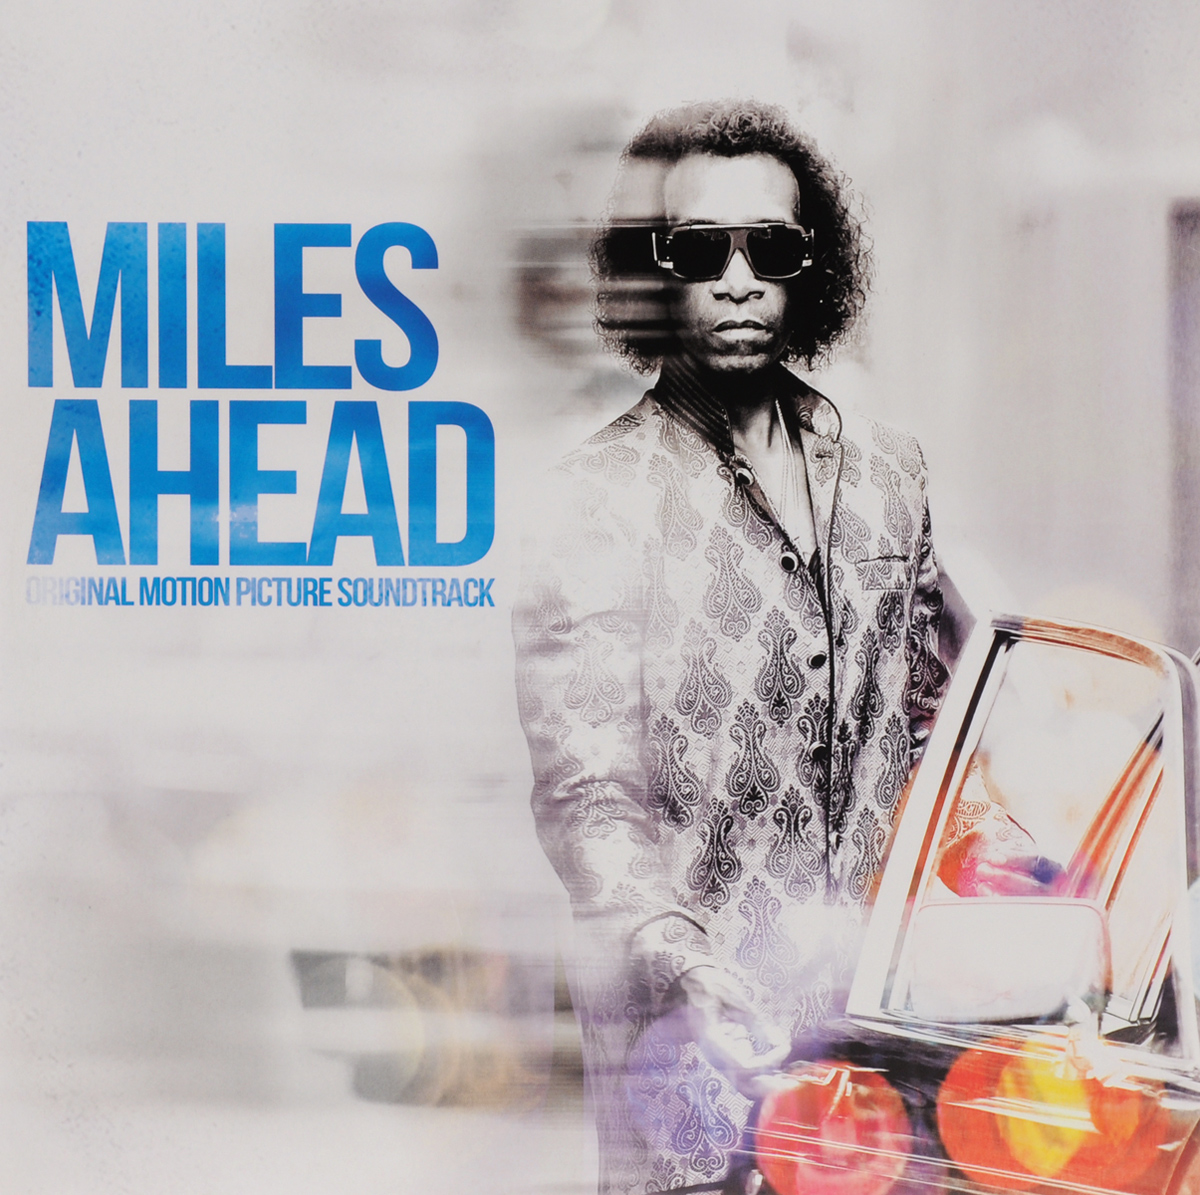 Майлз Дэвис Miles Ahead. Original Motion Picture Soundtrack (2 LP) miles davis miles davis miles ahead original motion picture soundtrack 2 lp